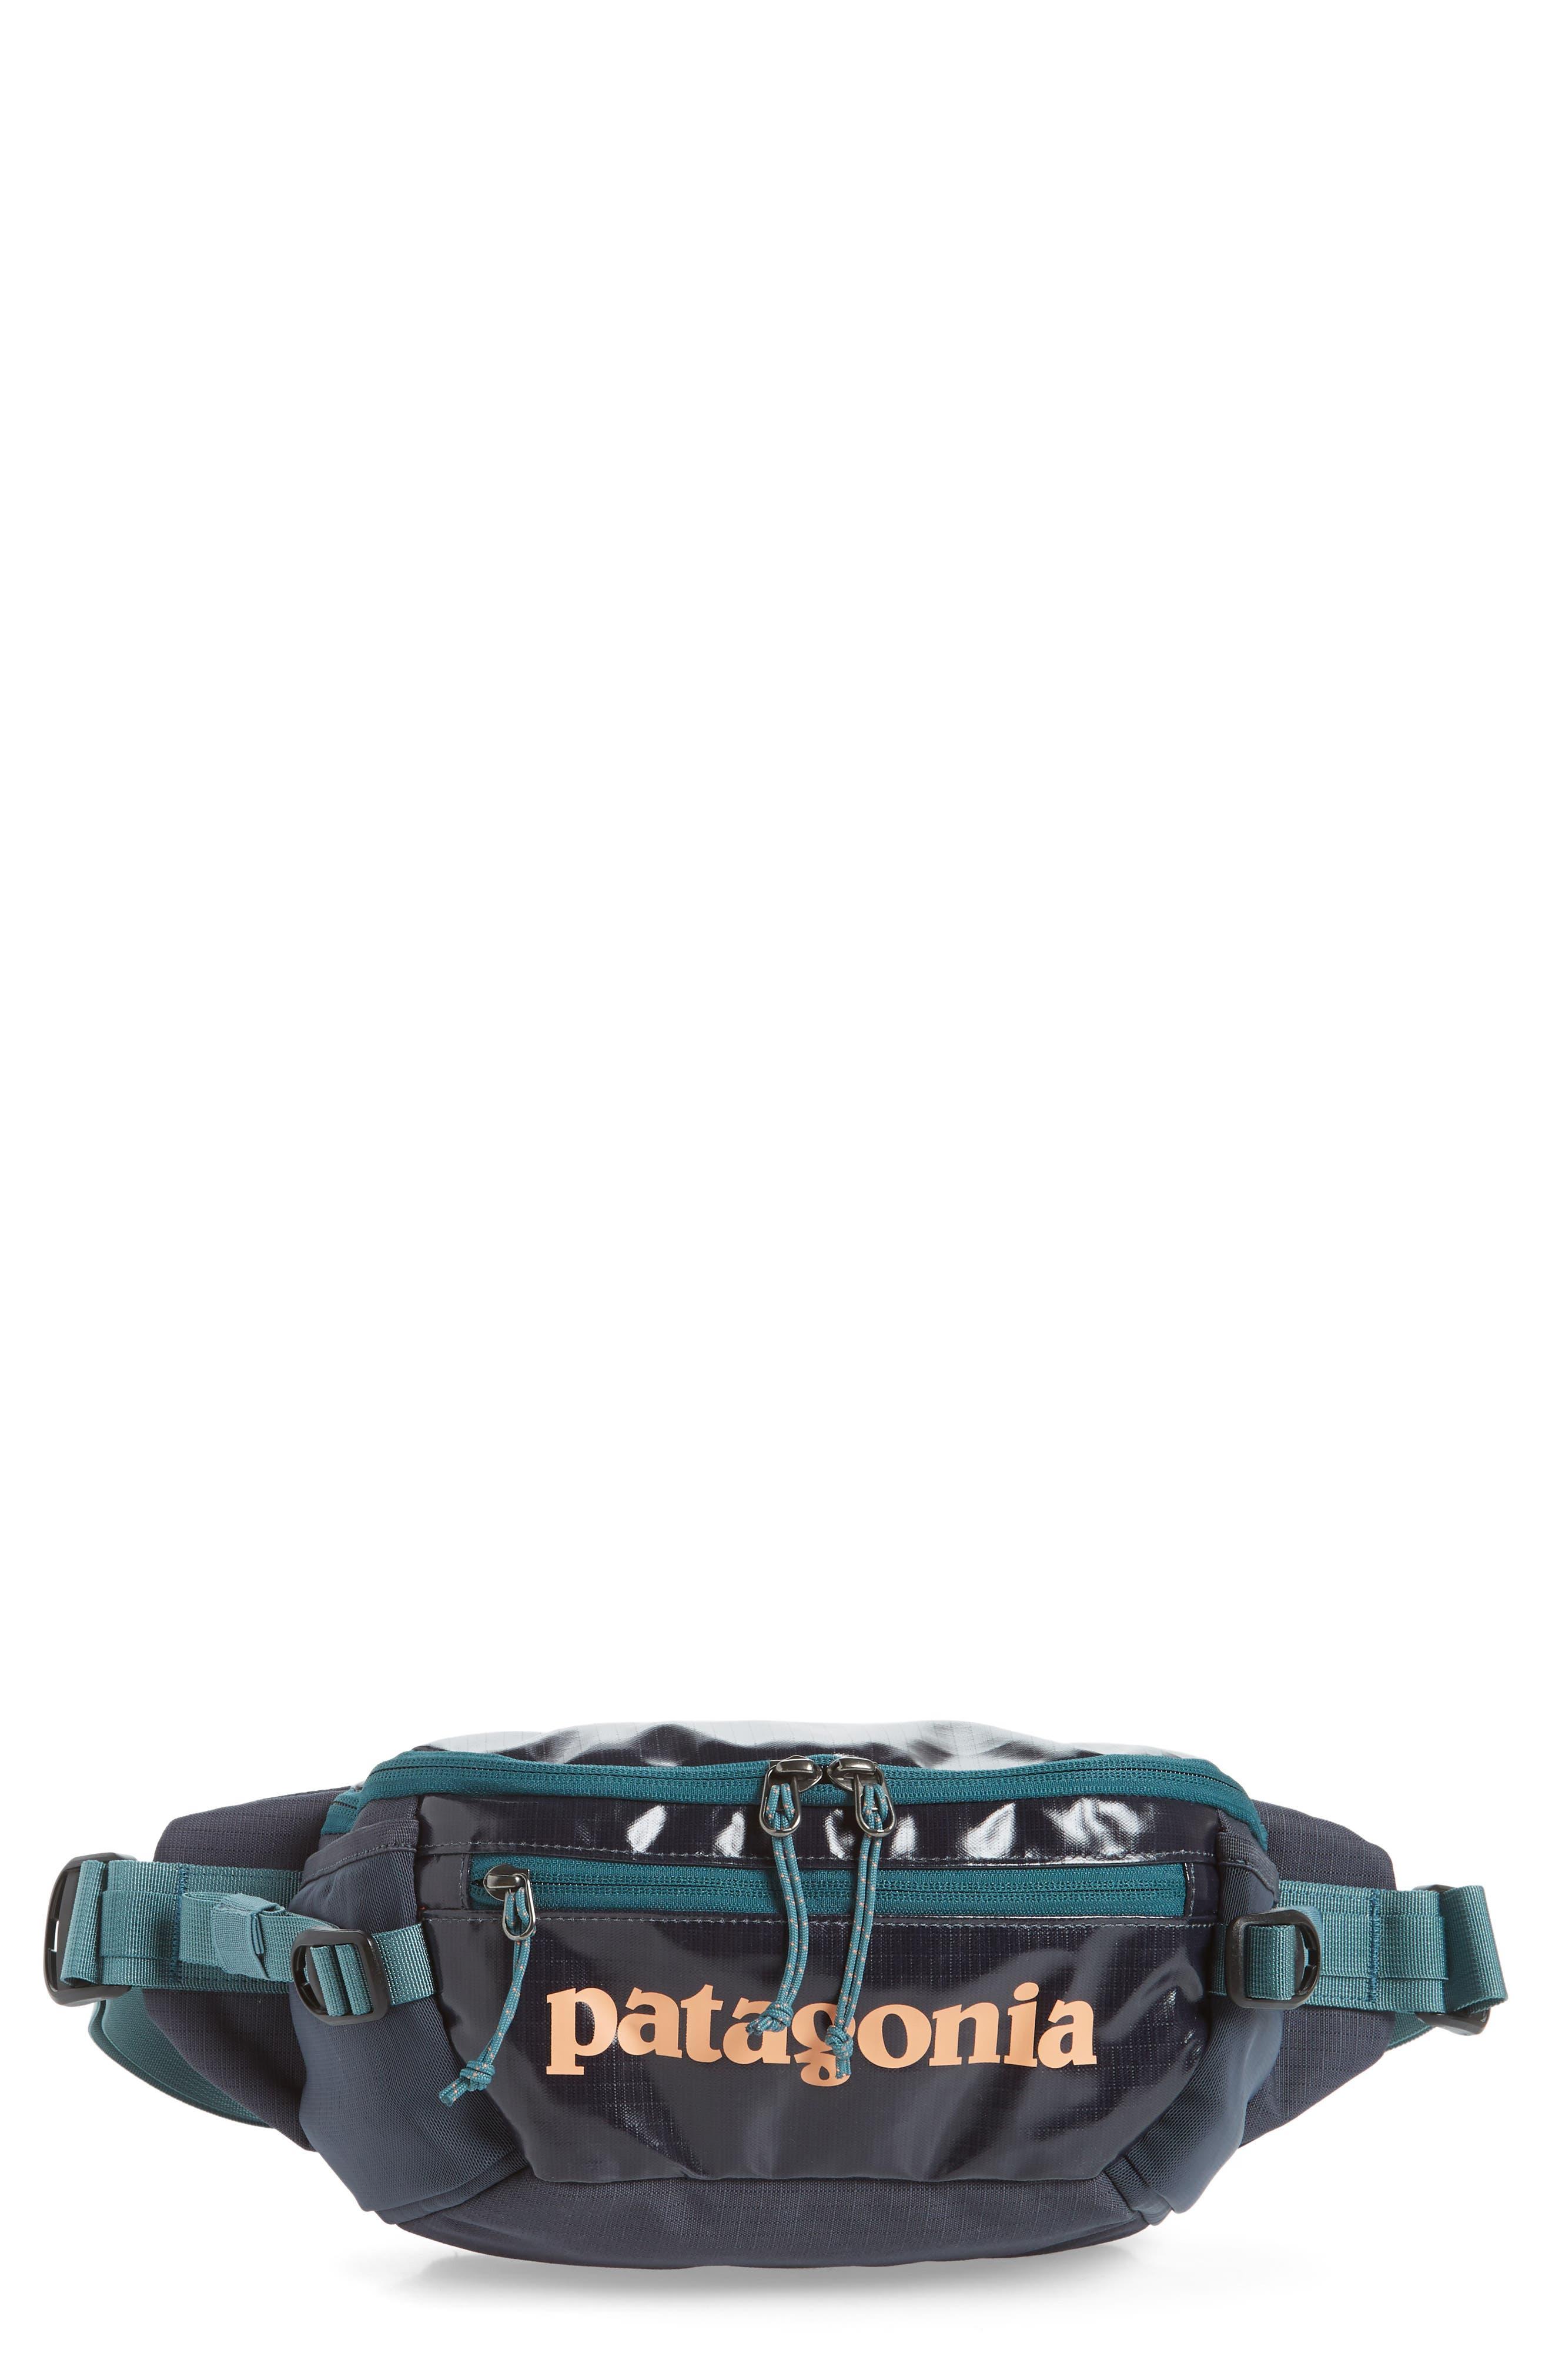 PATAGONIA Black Hole Waist Pack, Main, color, SMOLDER BLUE